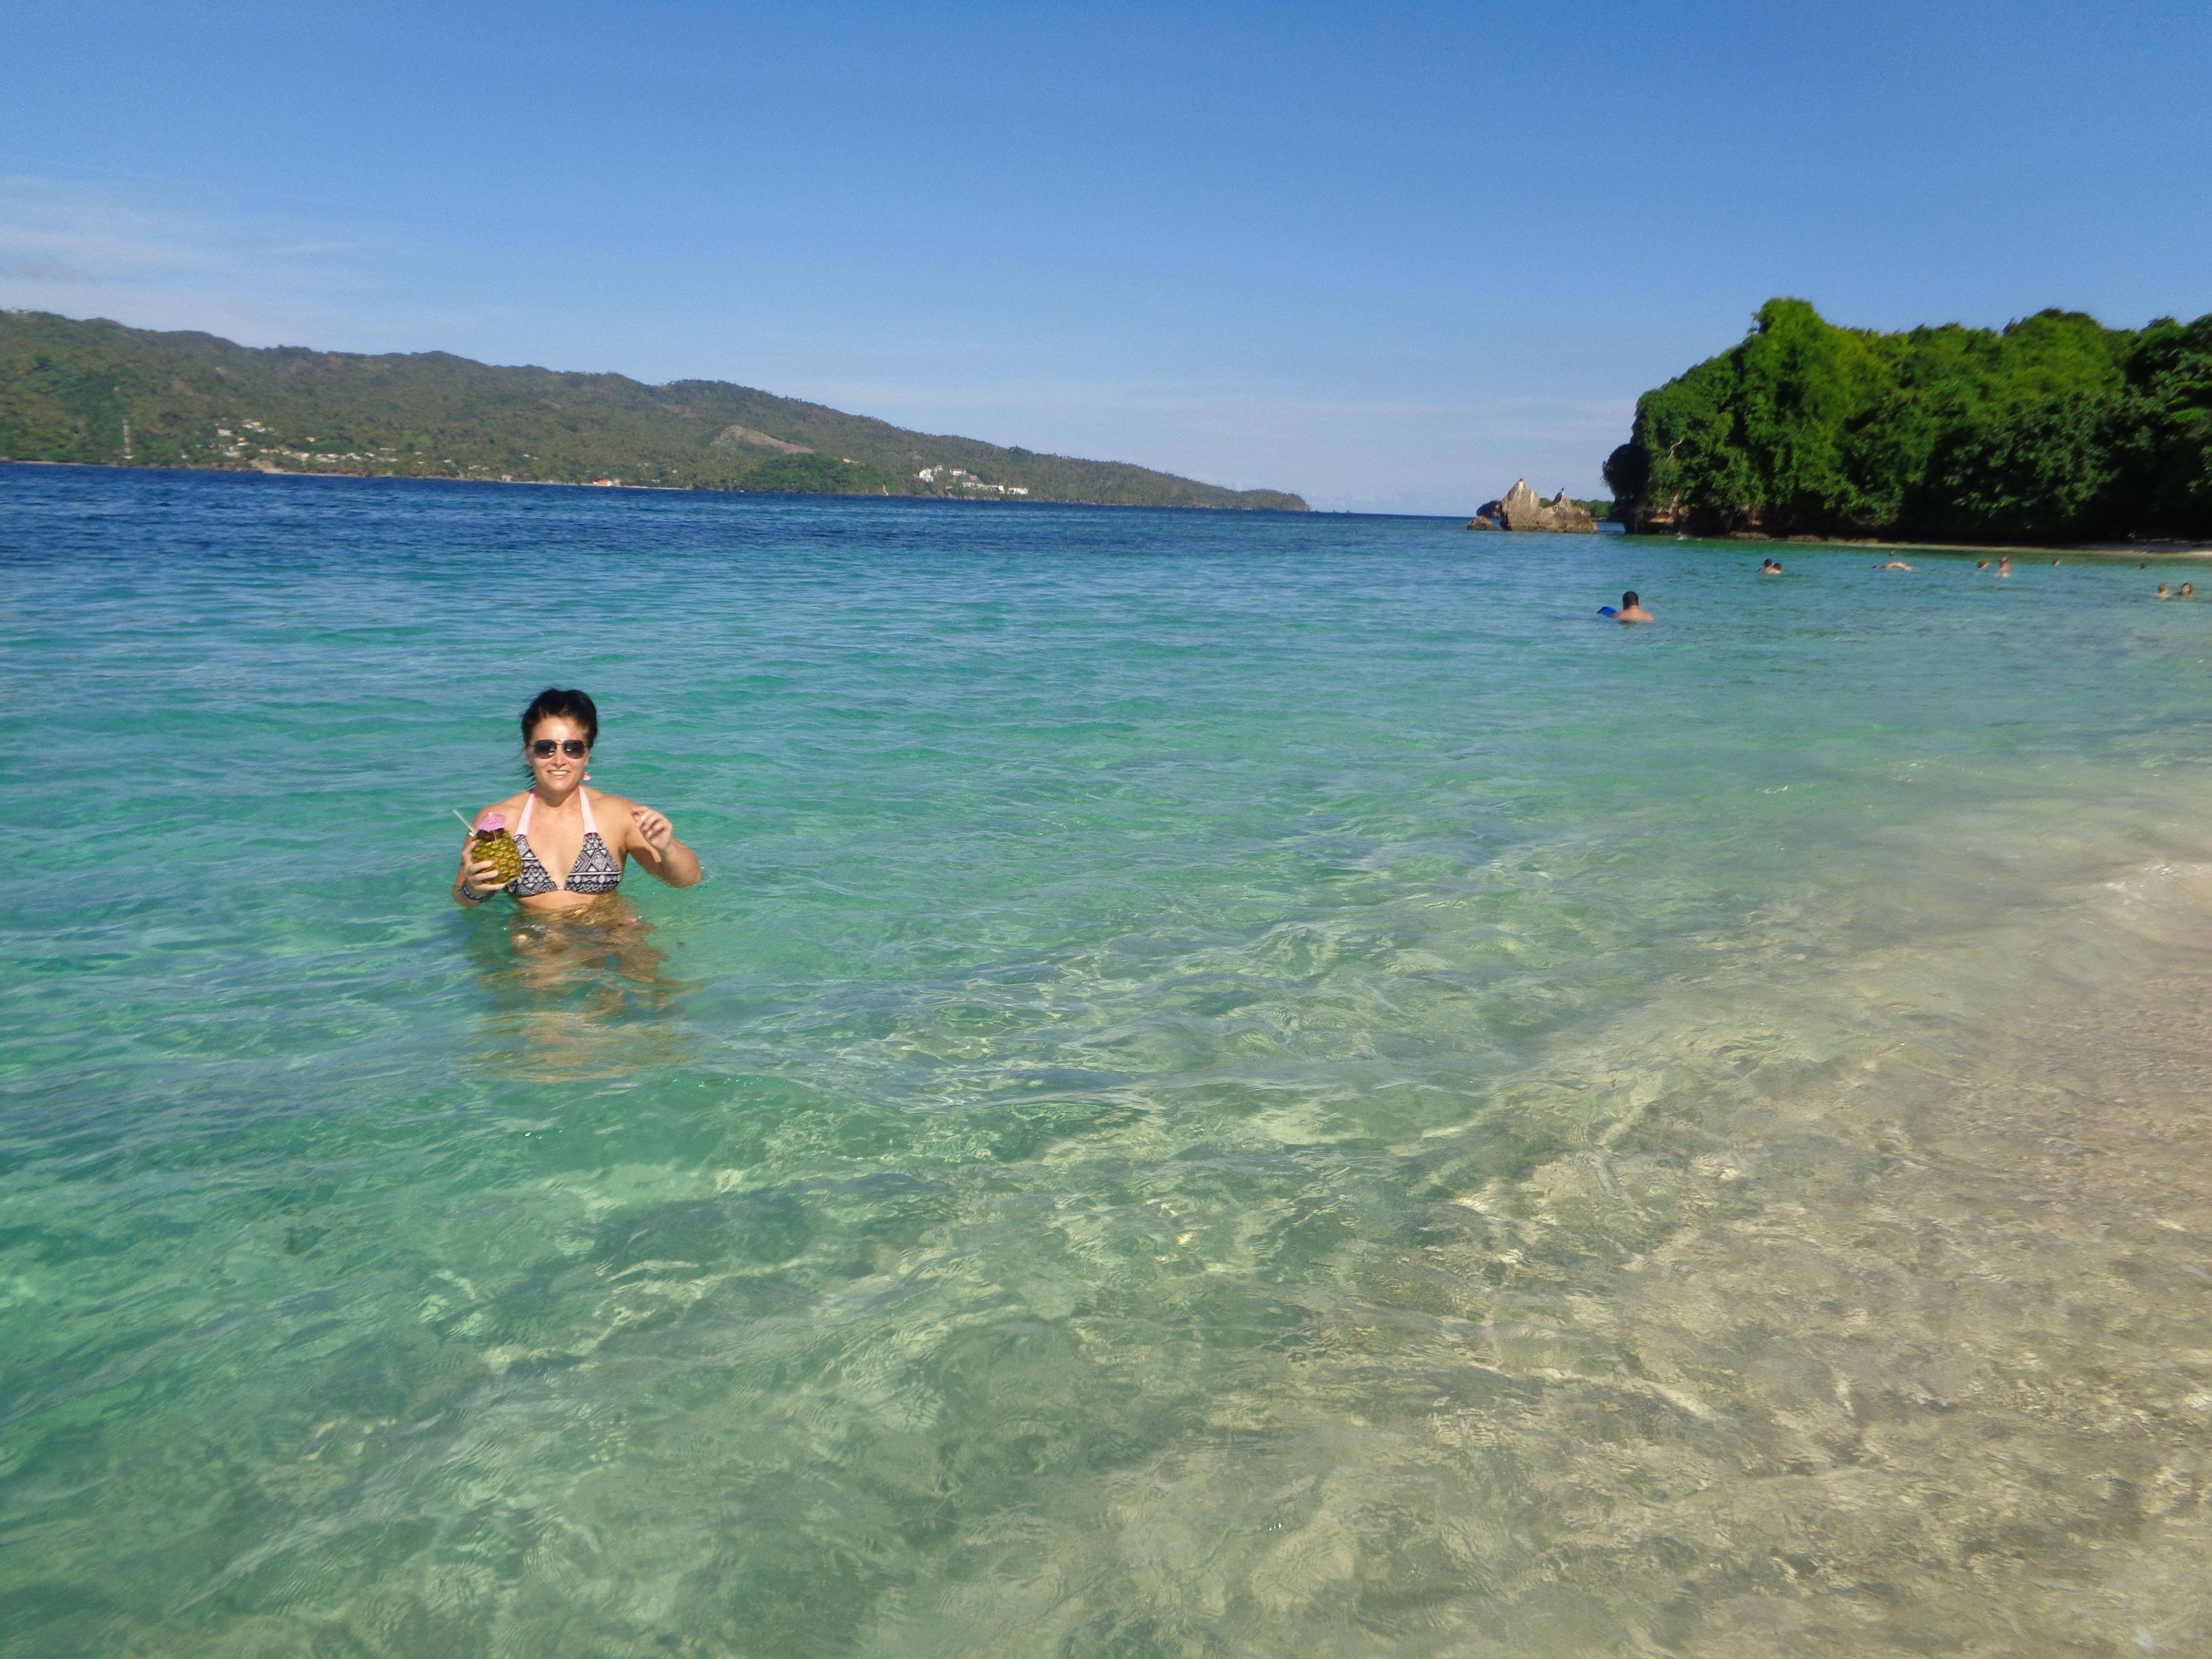 Cayo Levantado Samana Dominican Republic  Small island off the